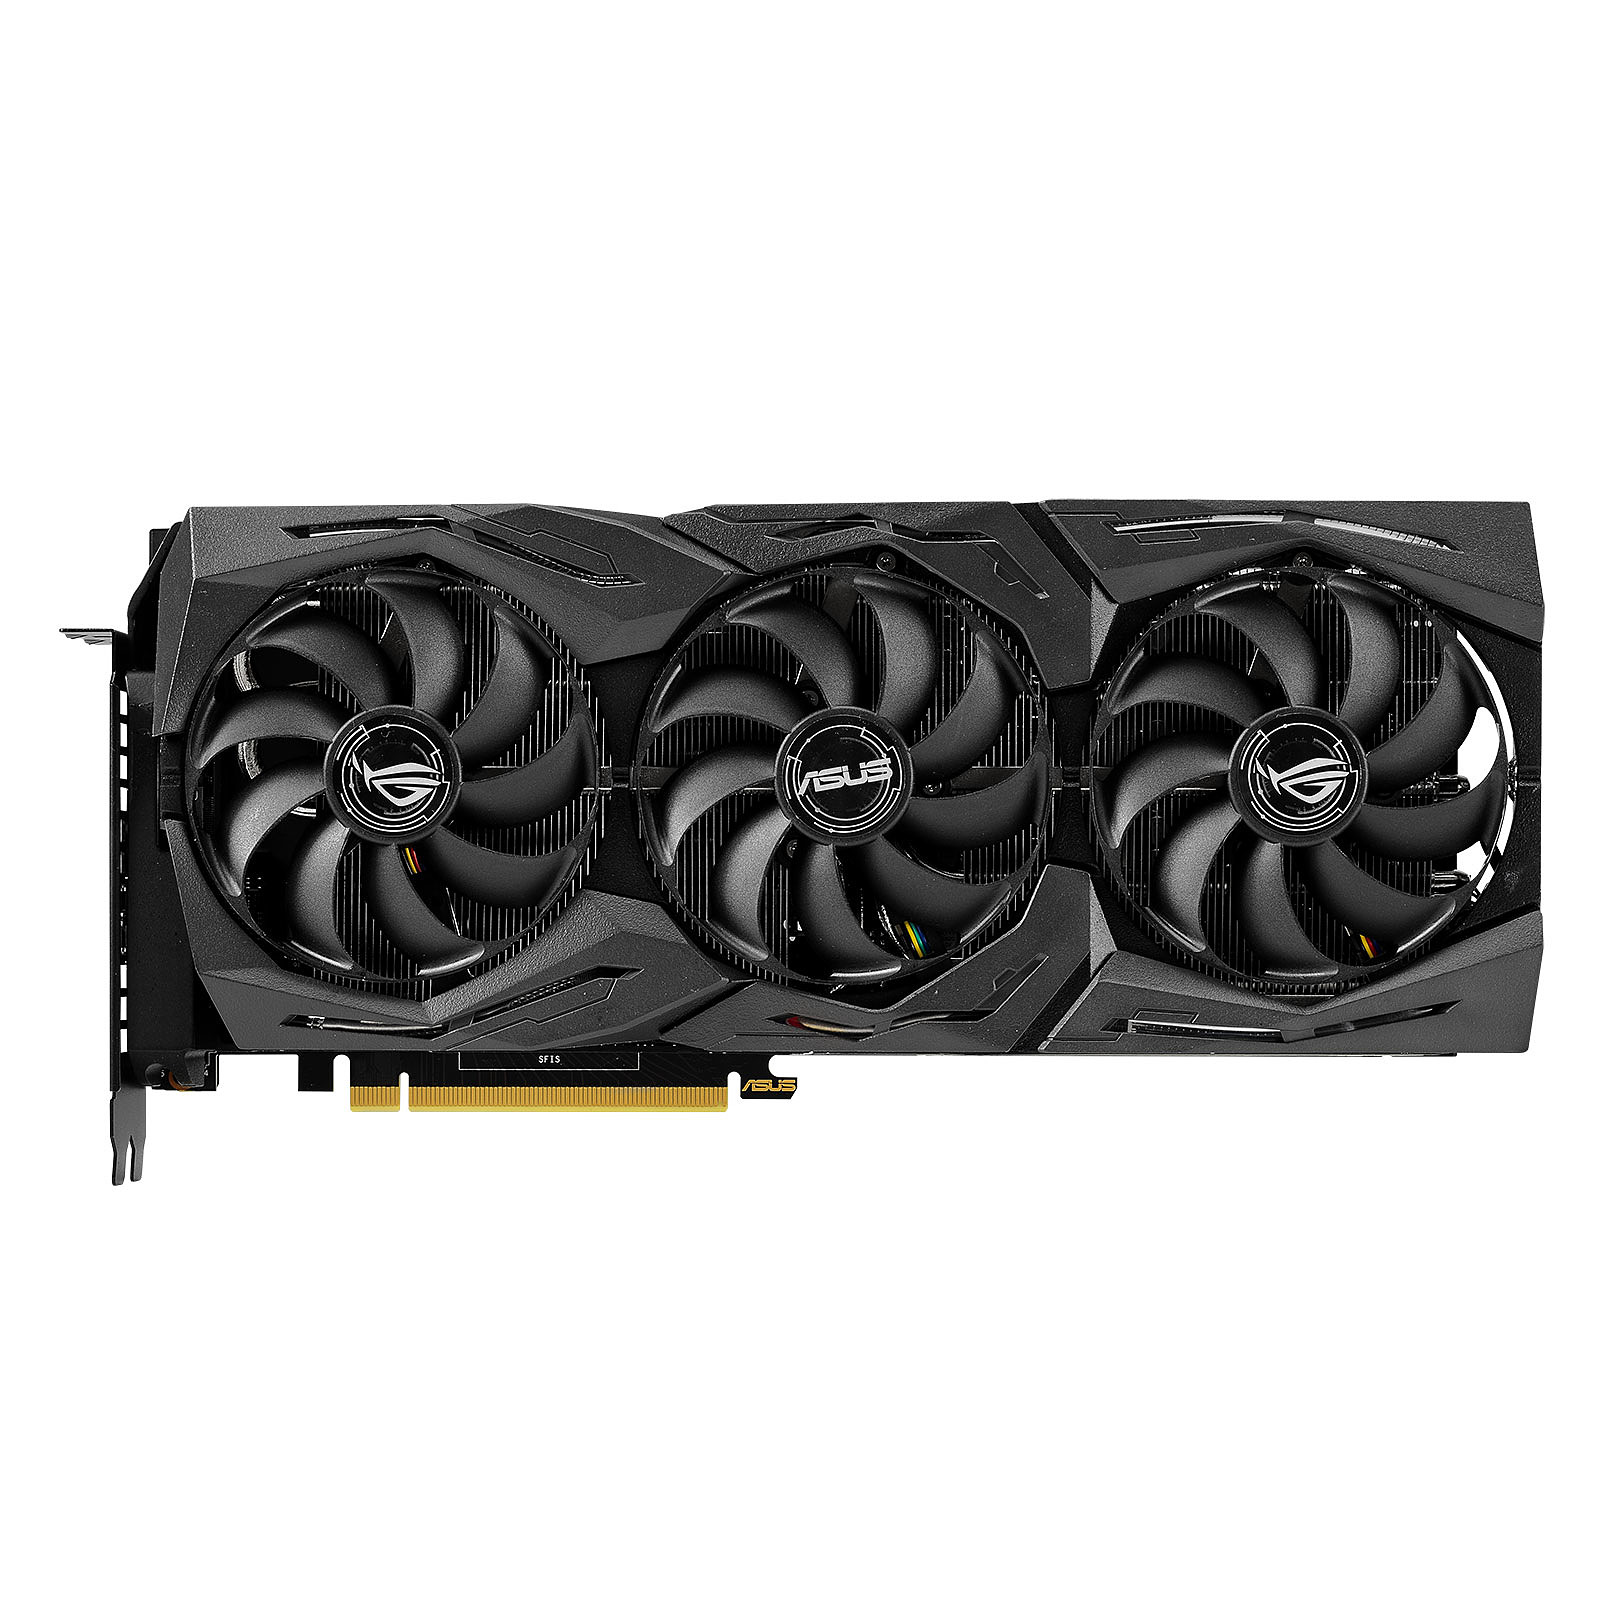 ASUS GeForce RTX 2080 Ti ROG-STRIX-RTX2080TI-O11G-GAMING (BULK)